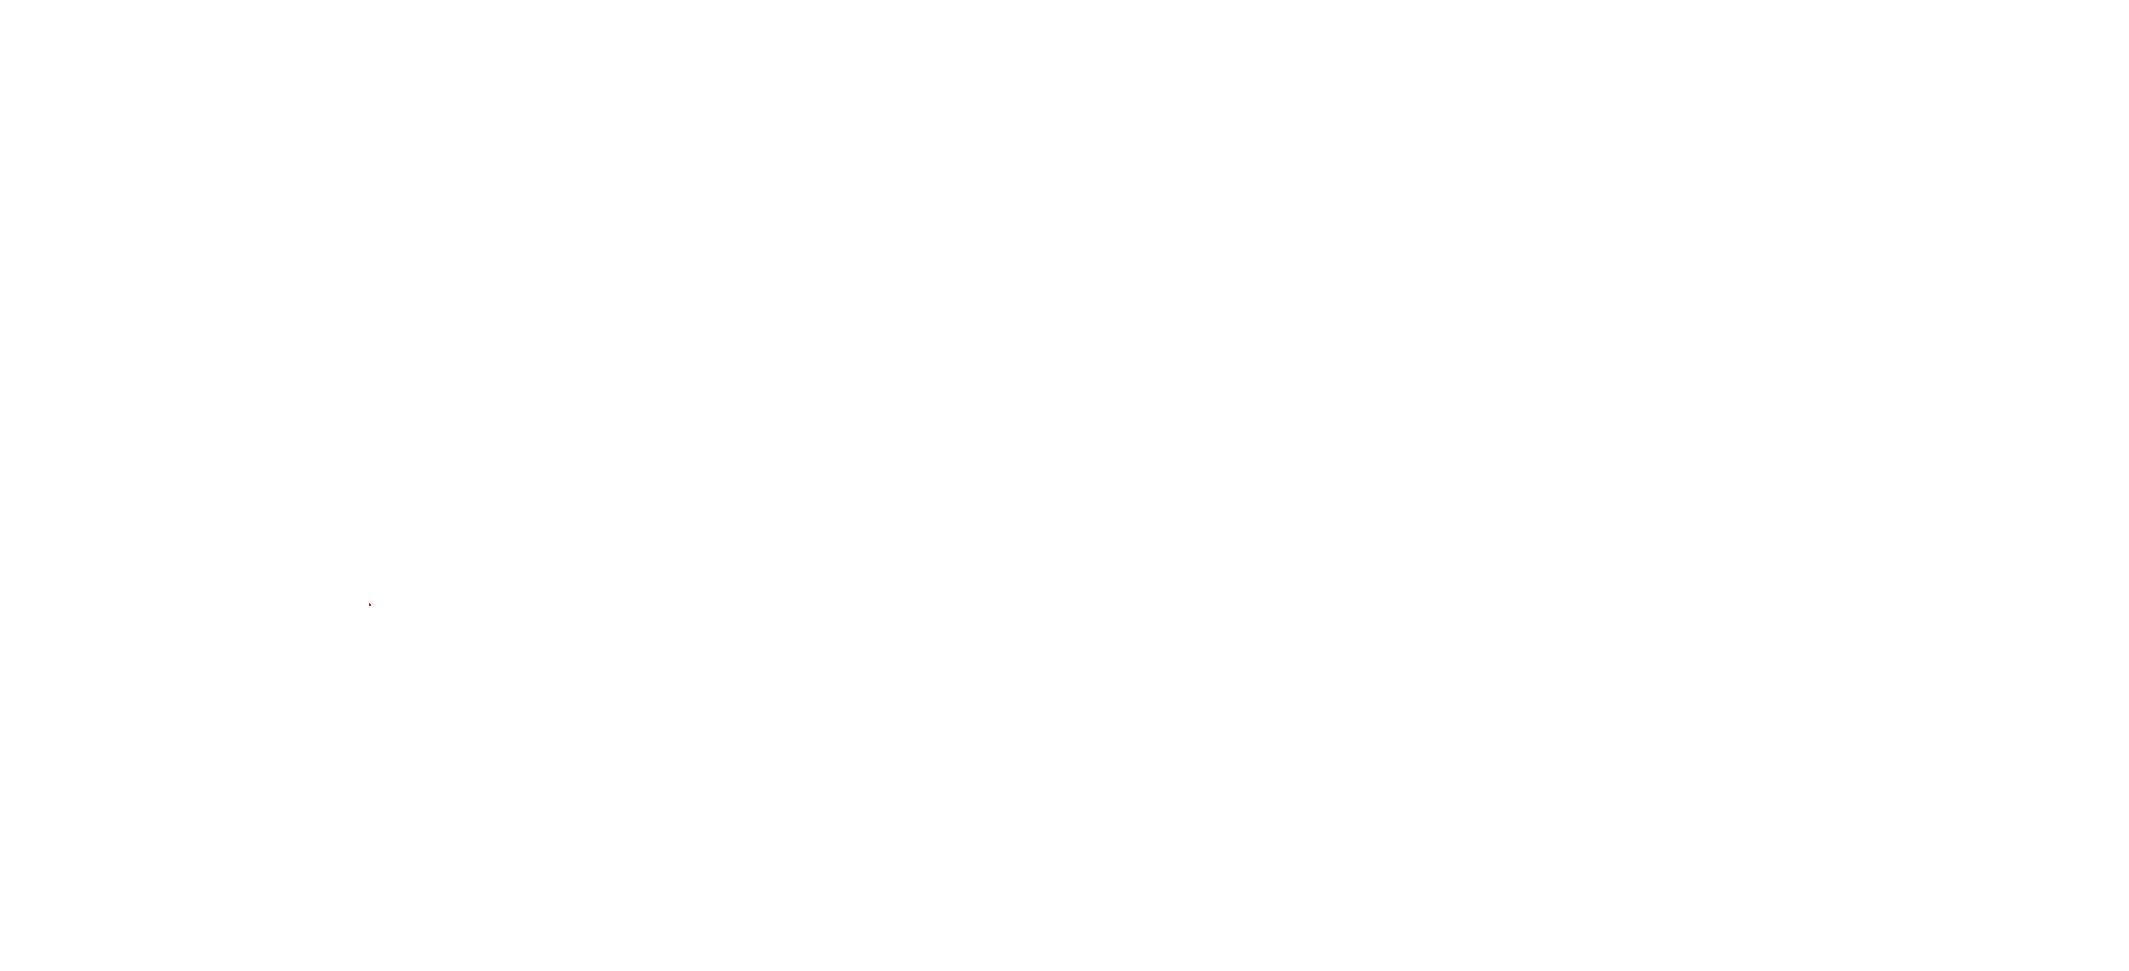 Cambodian Angel Investors Network